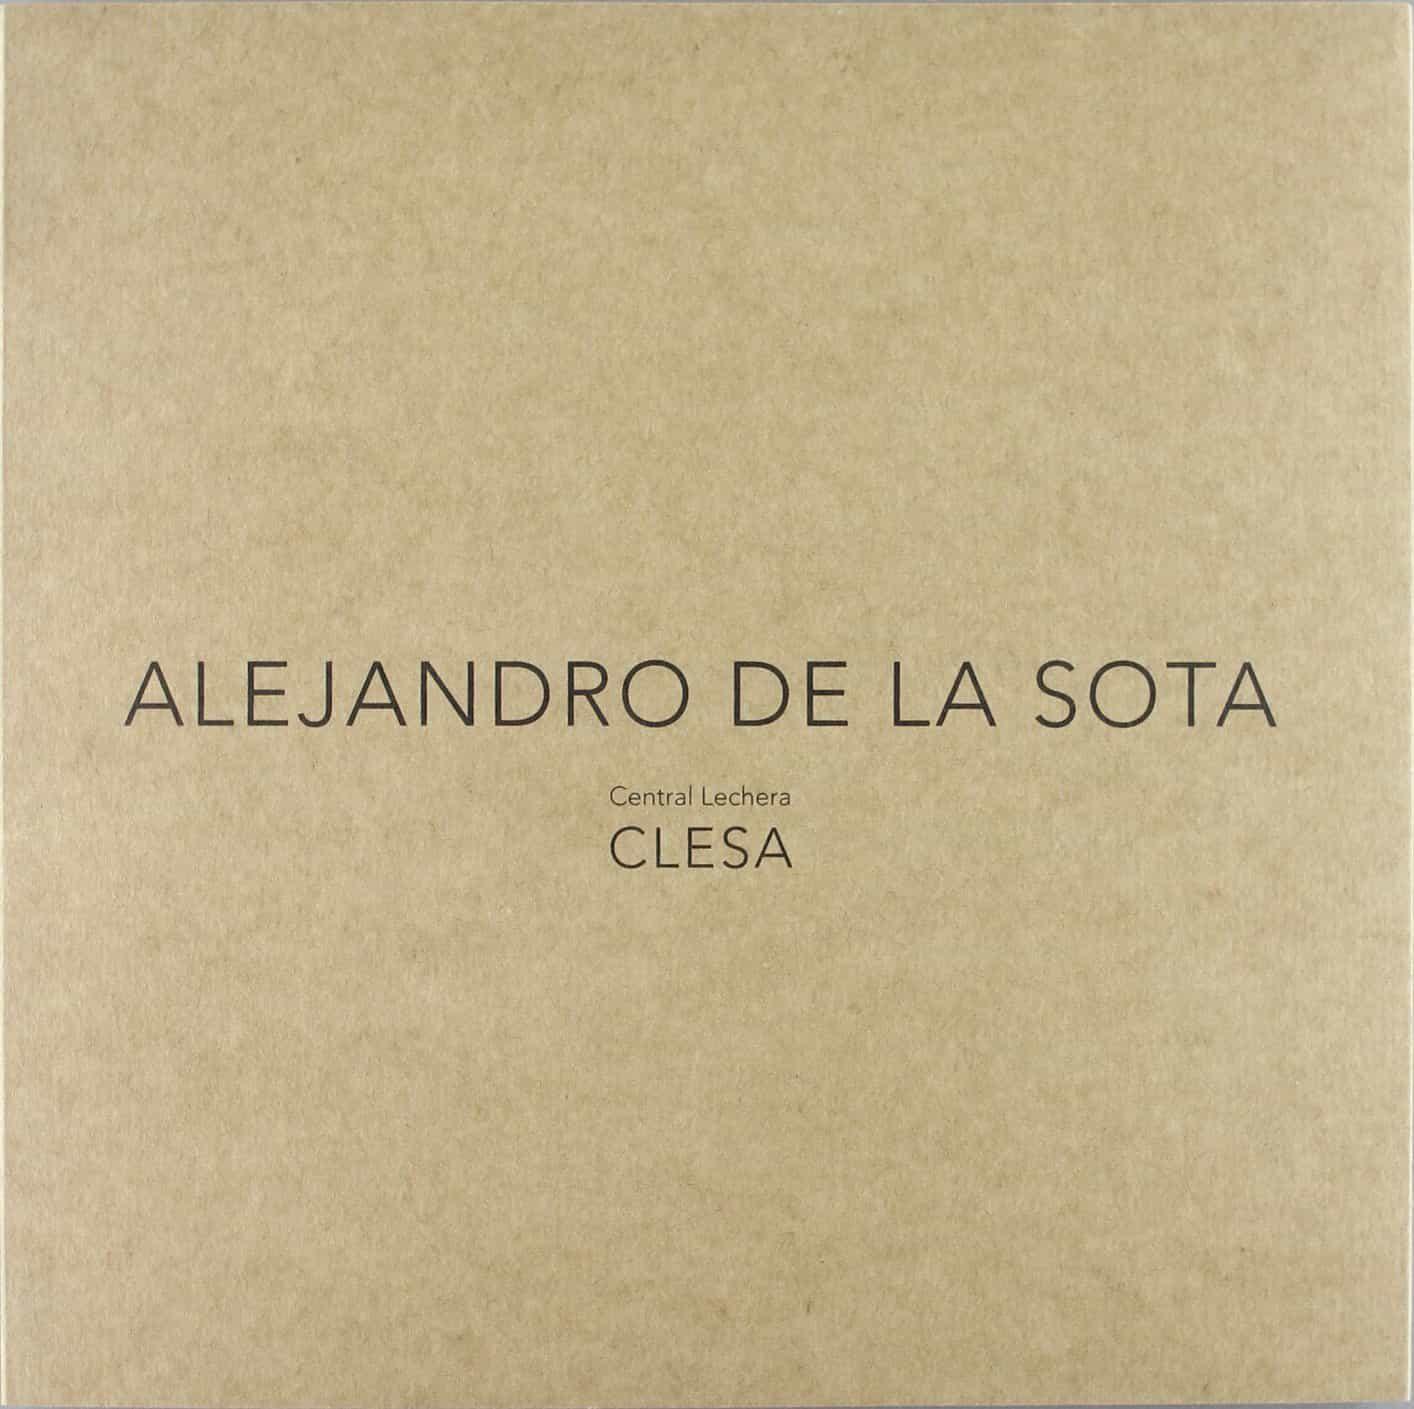 Alejandro De La Sota: Central Lechera Clesa por Vv.aa. epub